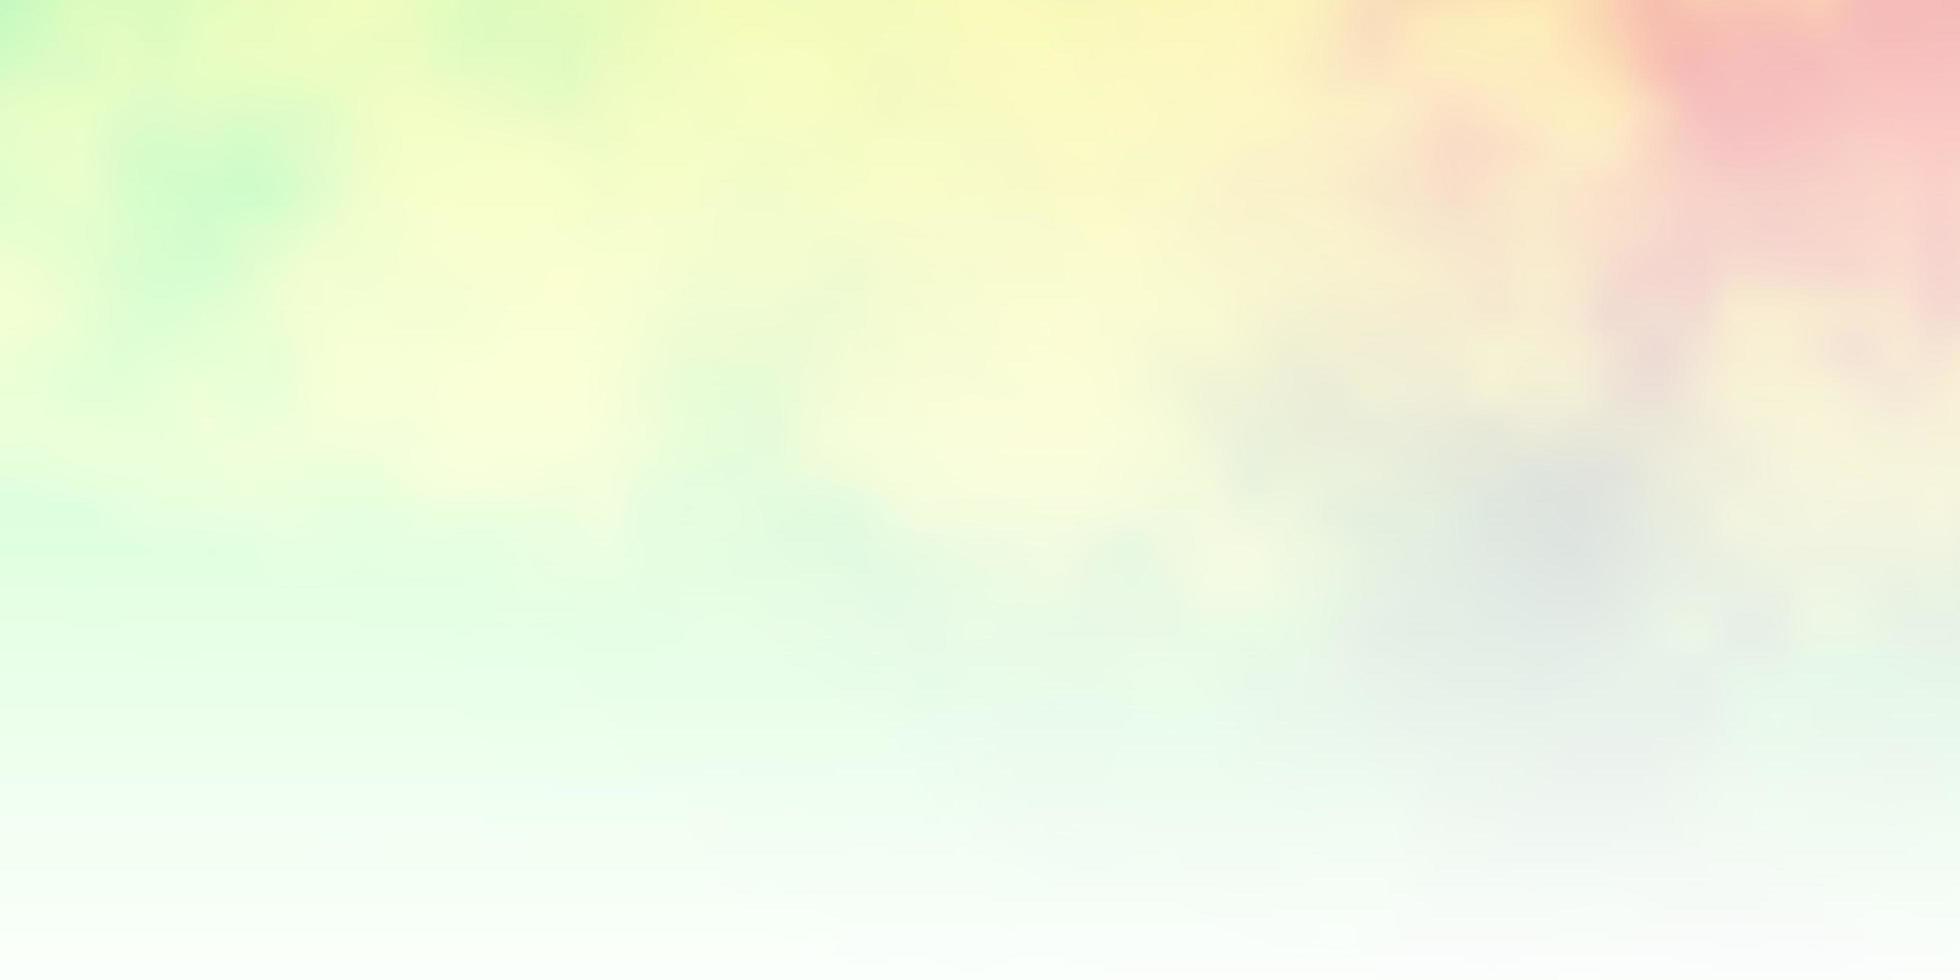 layout de vetor verde e amarelo claro com cloudscape.